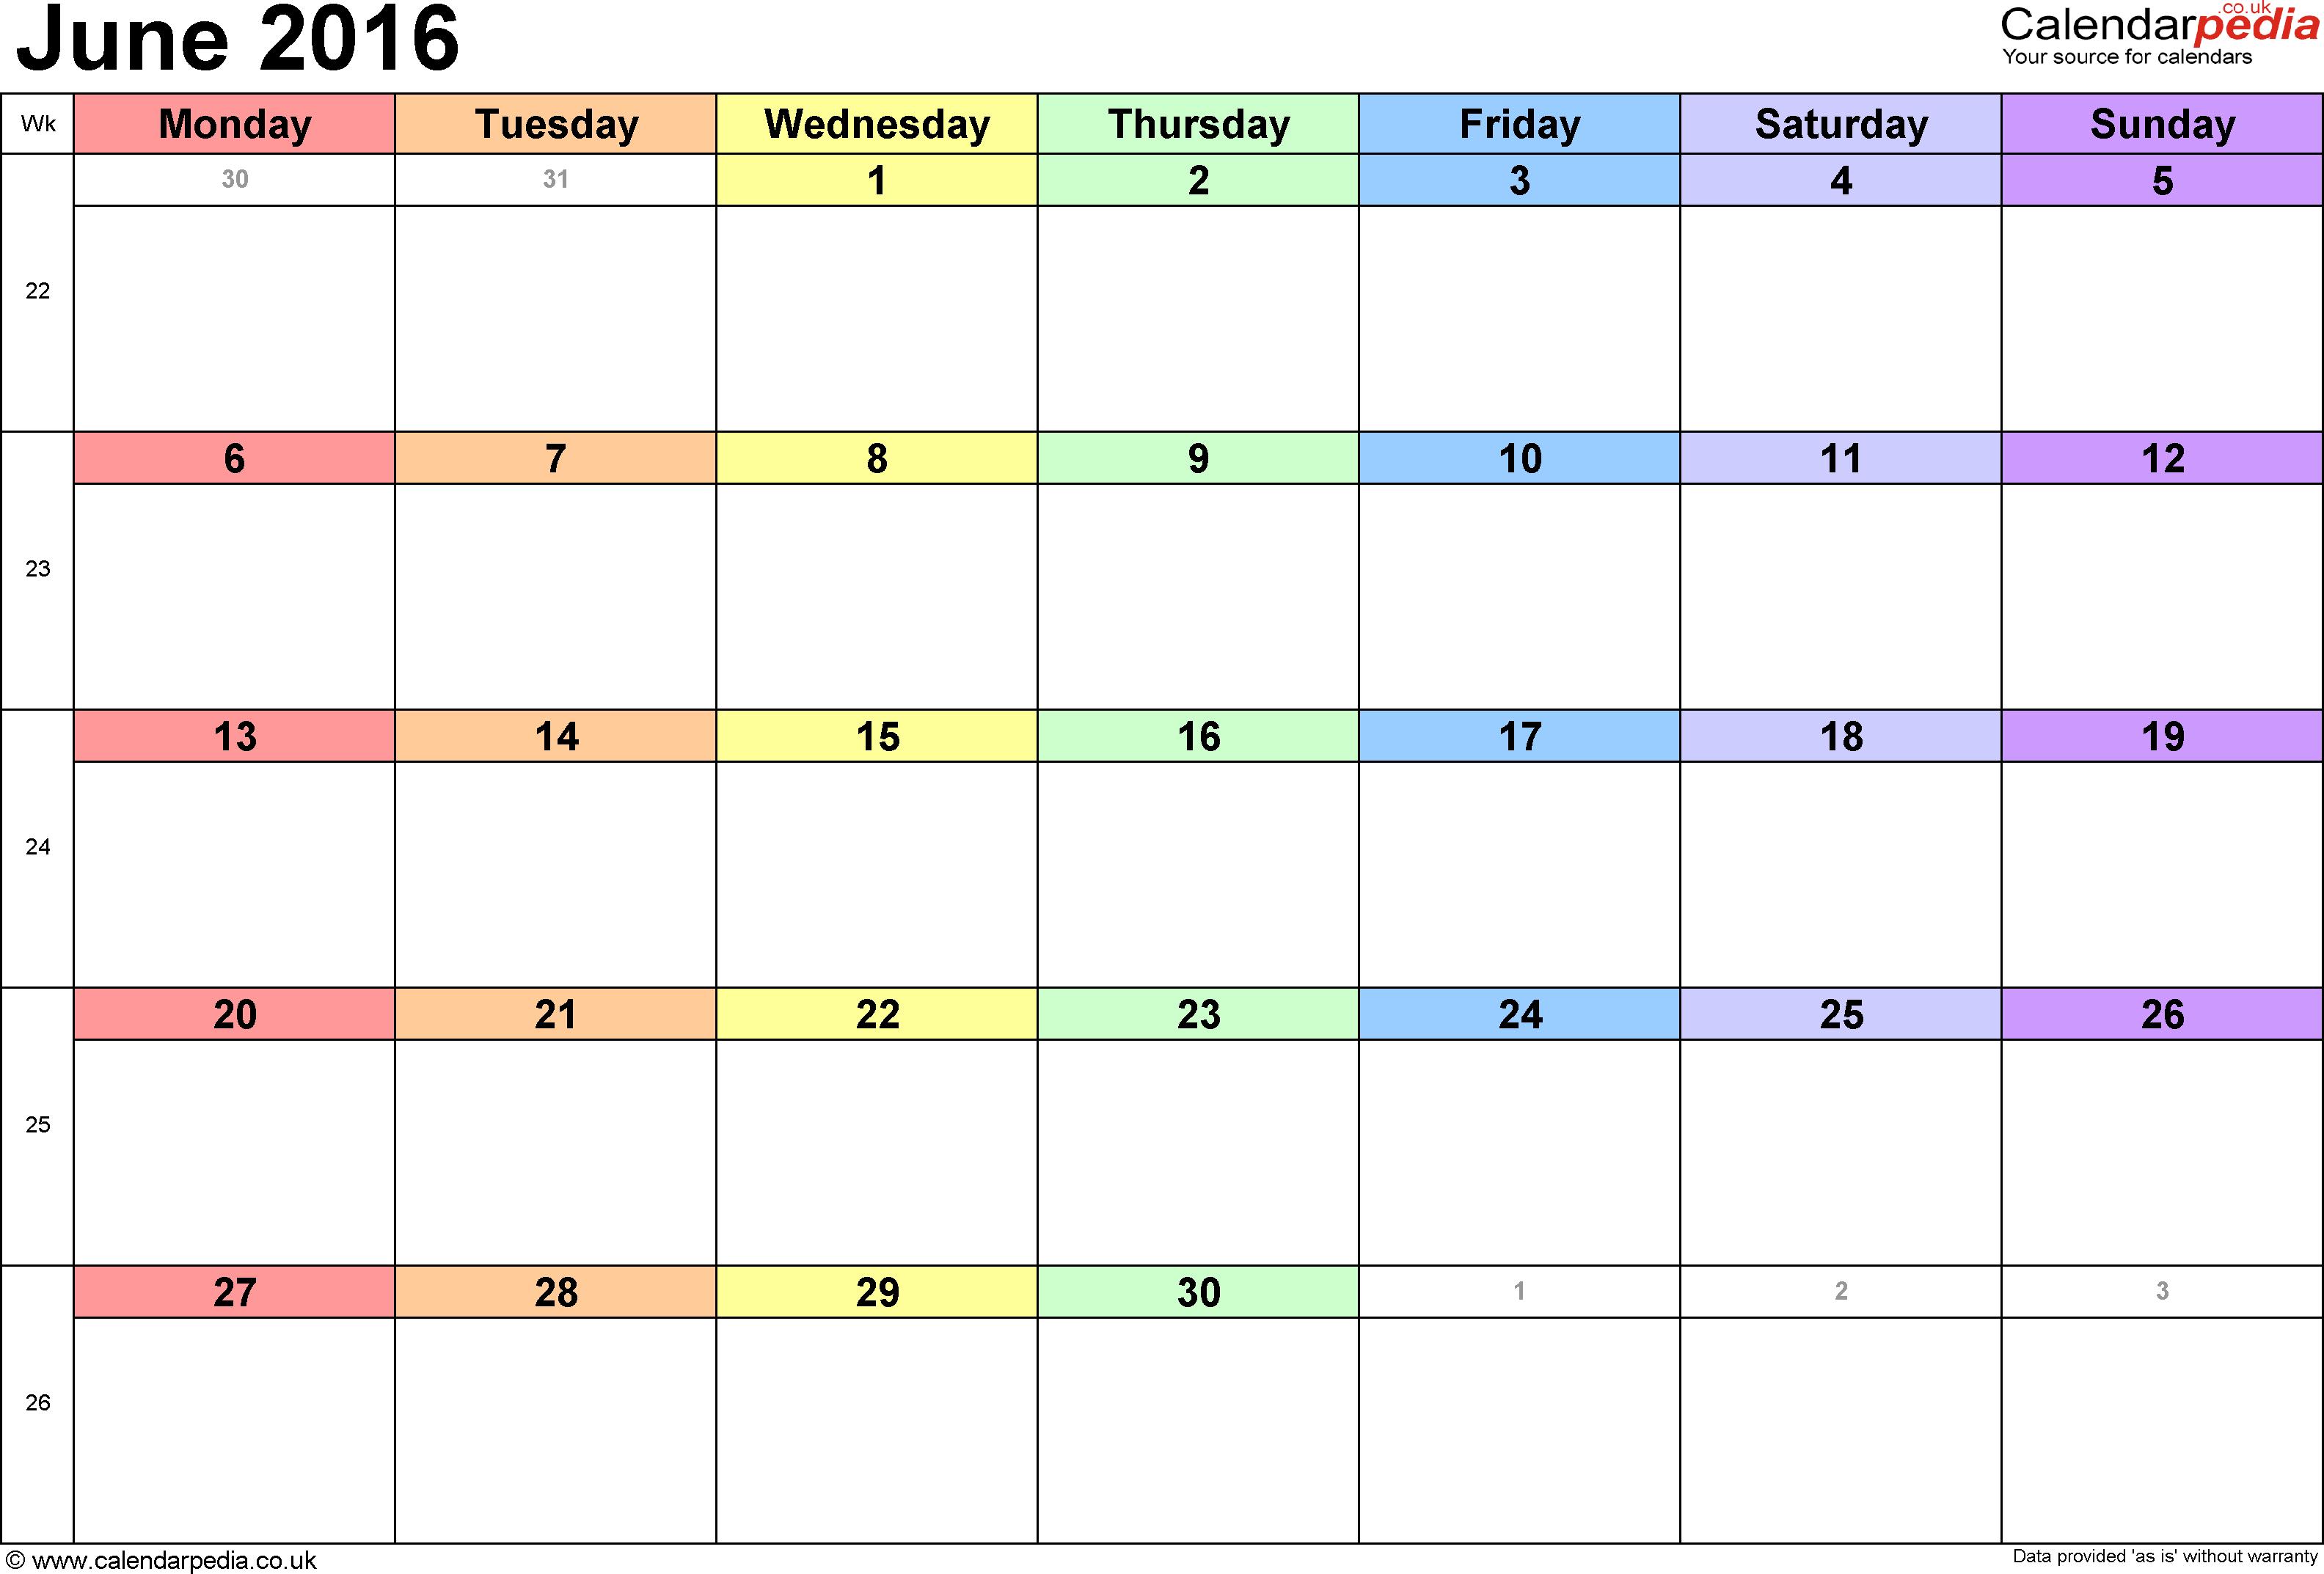 Blank june calendar clipart clipart freeuse download 2016 Calendar Clipart clipart freeuse download